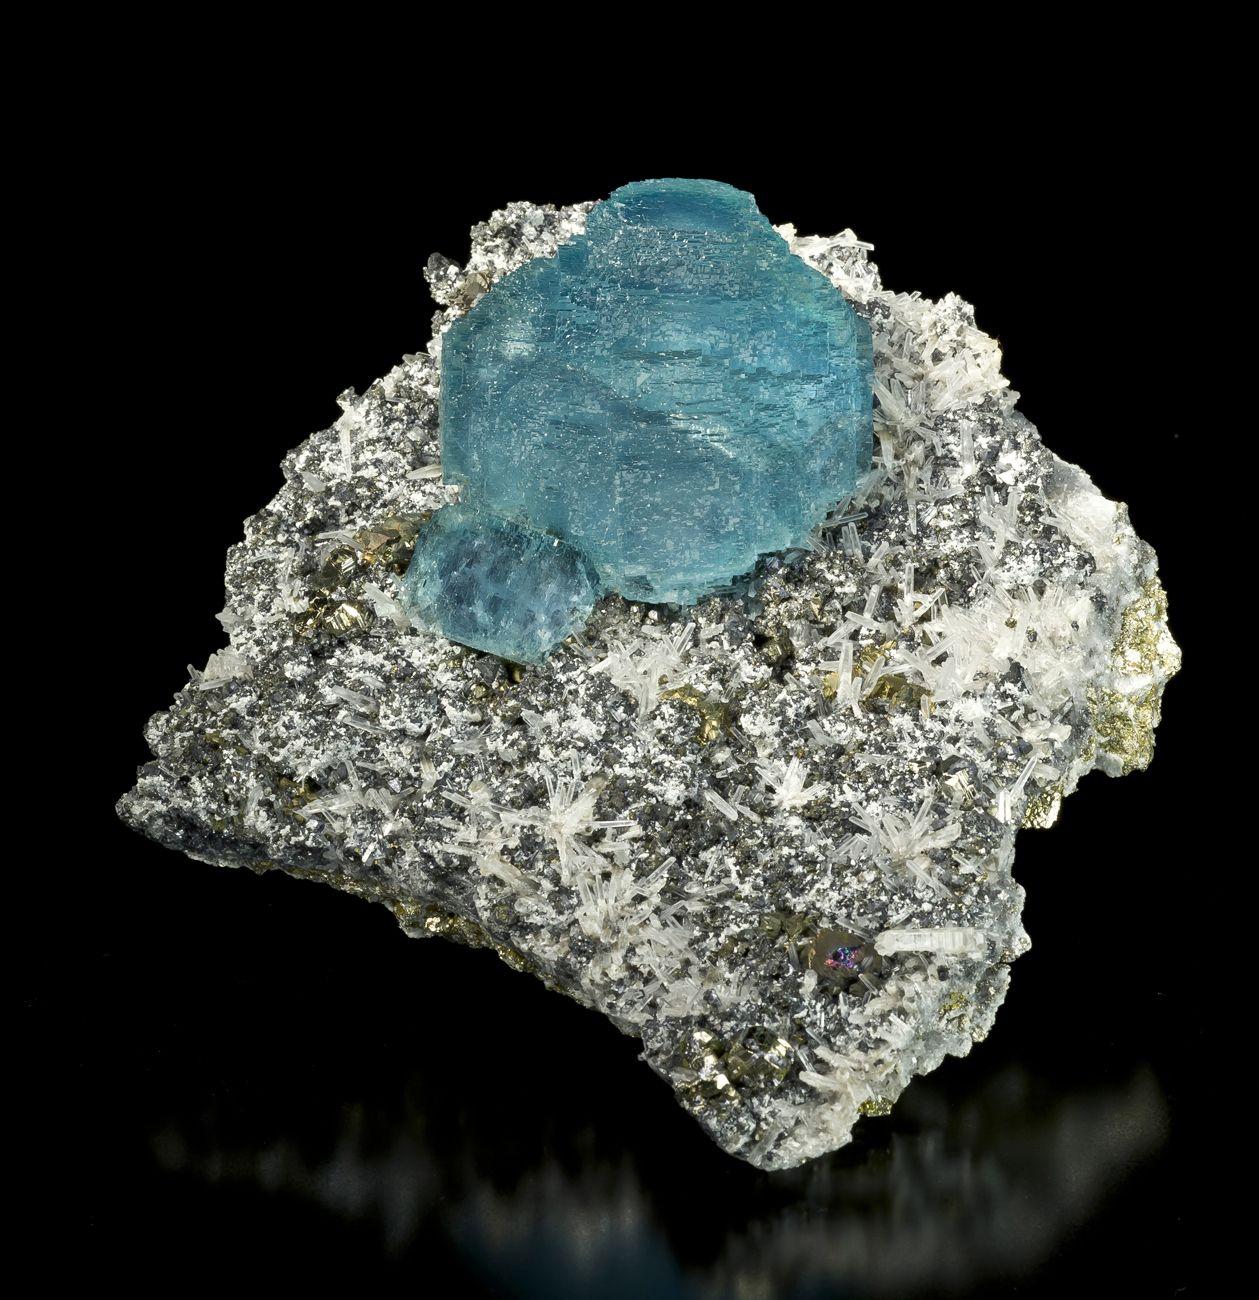 Fluorite on Quartz from 2002 Pocket, Sweet Home Mine, Alma, Colorado, USA [db_pics/new2011/Fluorite-SweetHomeMine-Colorado-15cm-JB490-06.jpg]